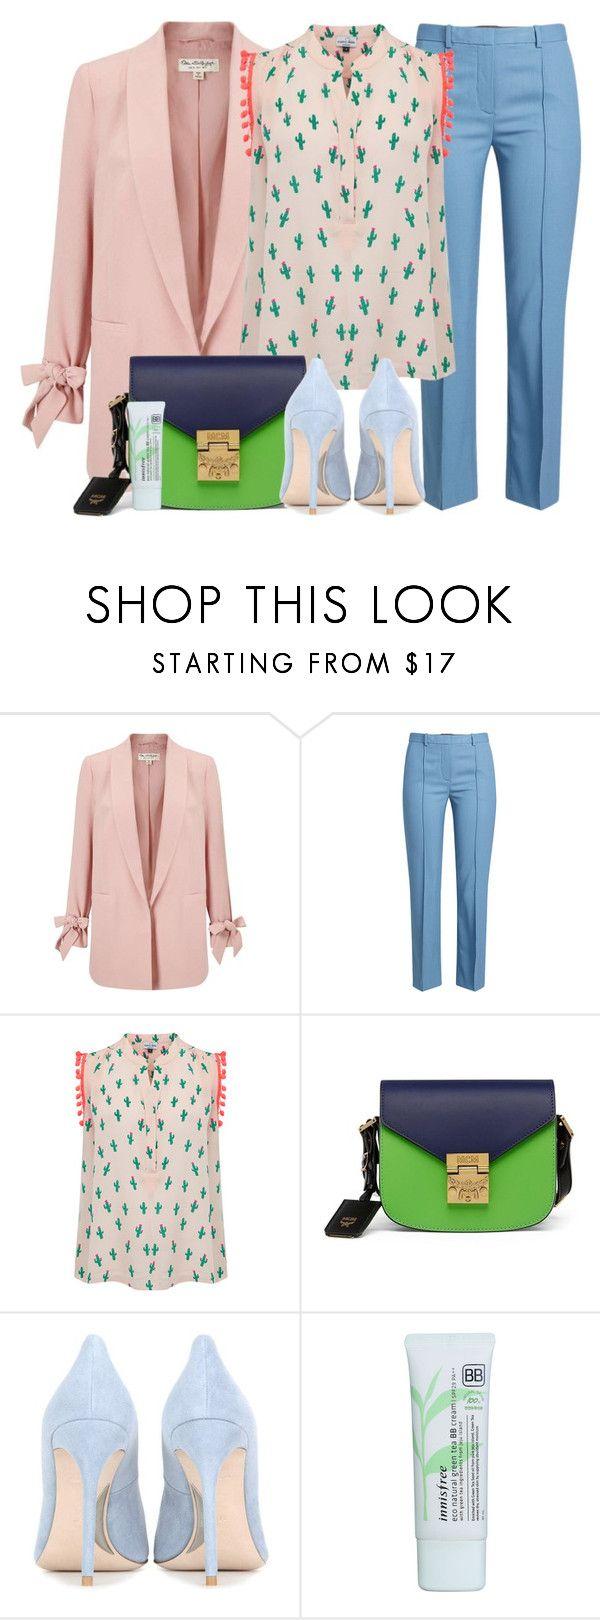 """Spring Fashion #3"" by ella178 ❤ liked on Polyvore featuring Miss Selfridge, Theory, Mercy Delta, MCM, Miu Miu, Innisfree, pastel, springfashion, springlooks and innisfreenaturalbbcream"